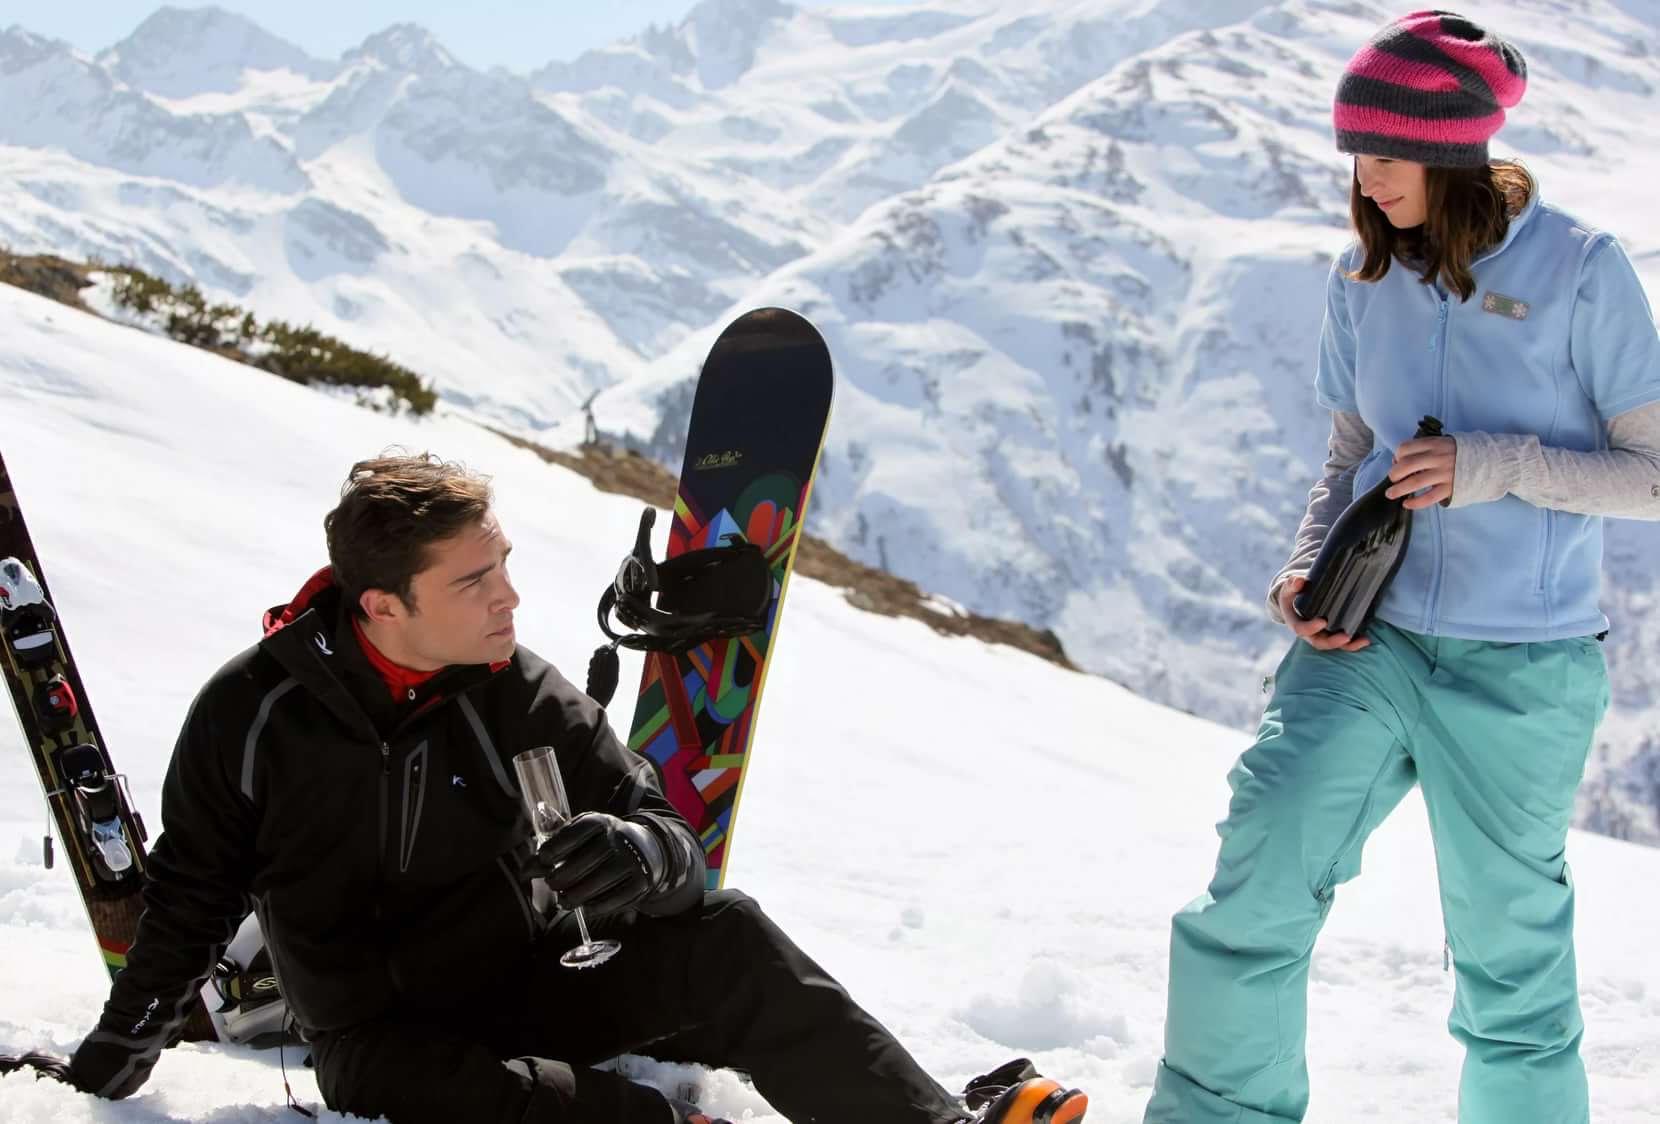 Бьюти-инструкция для занятий зимними видами спорта